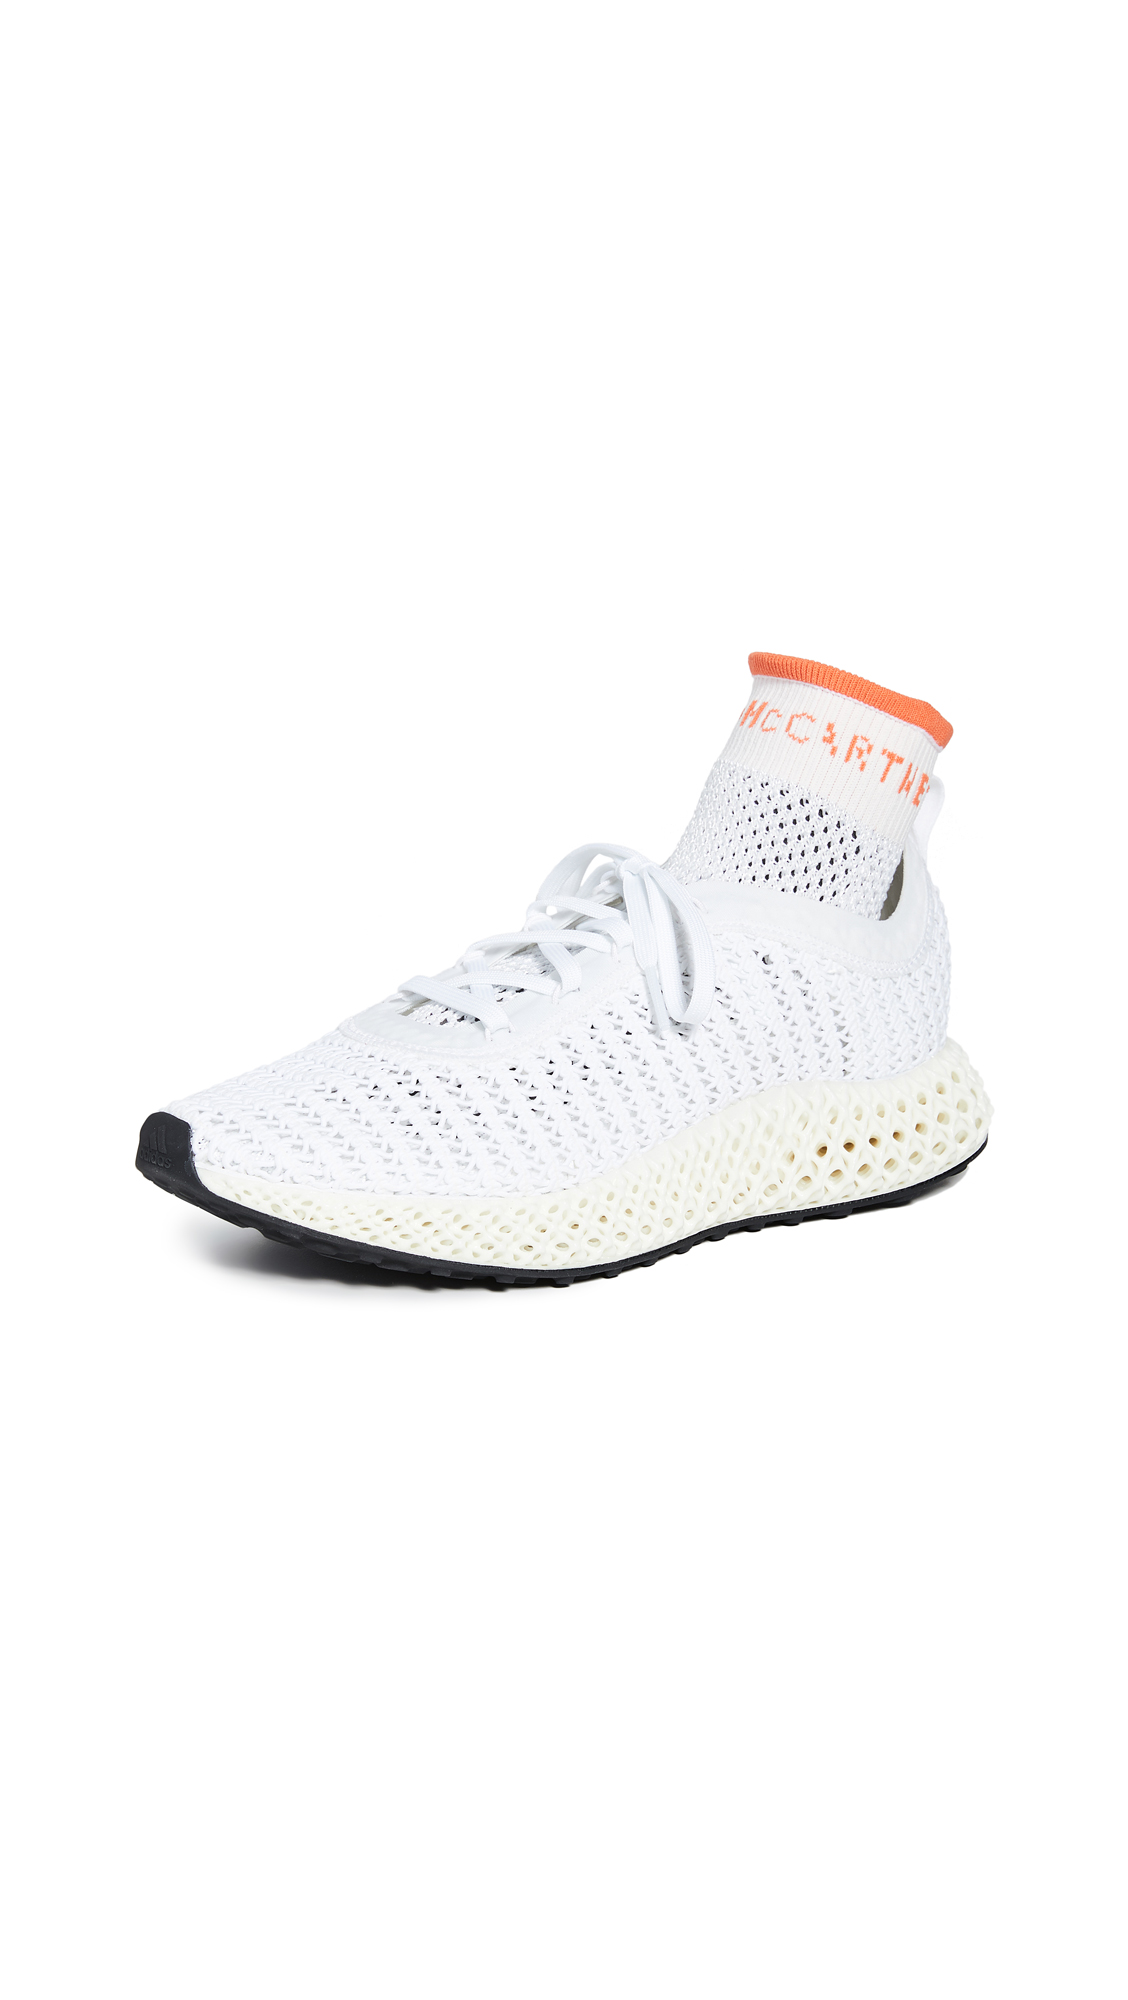 Buy adidas by Stella McCartney Alphaedge 4D Sneakers online, shop adidas by Stella McCartney